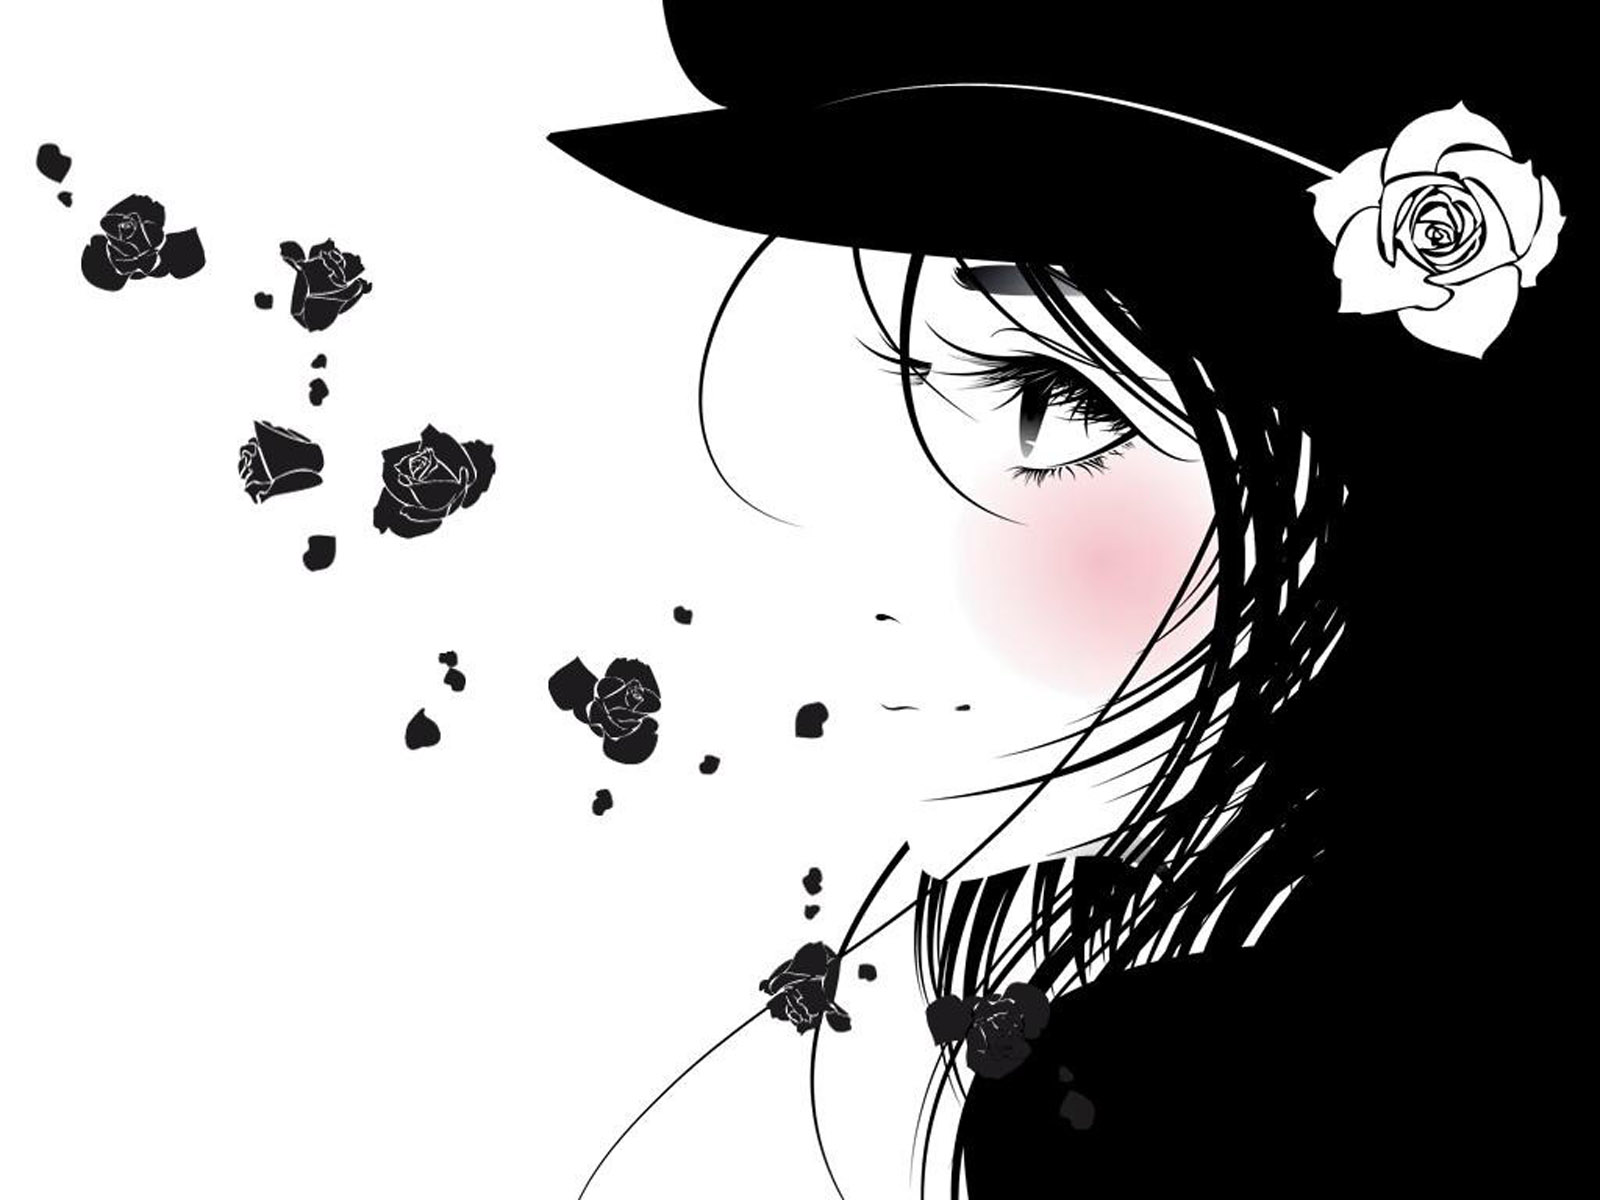 Emo Wallpapers Anime Wallpaper for Desktop   HD Wallpaper 1600x1200